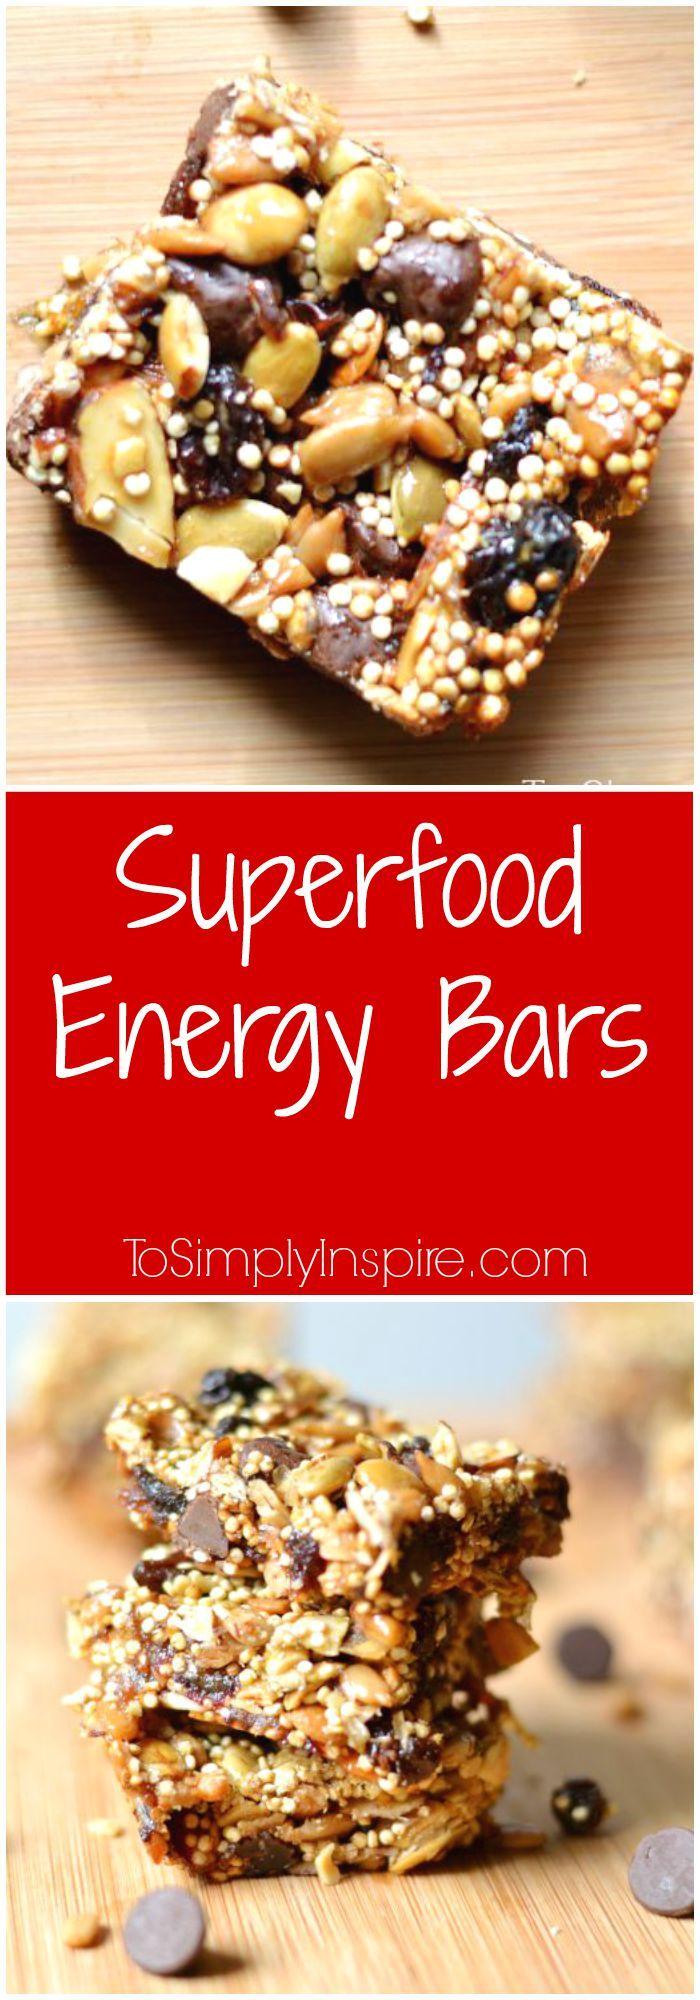 Superfood Energy Bars Recipe Honey Bar And Chocolate